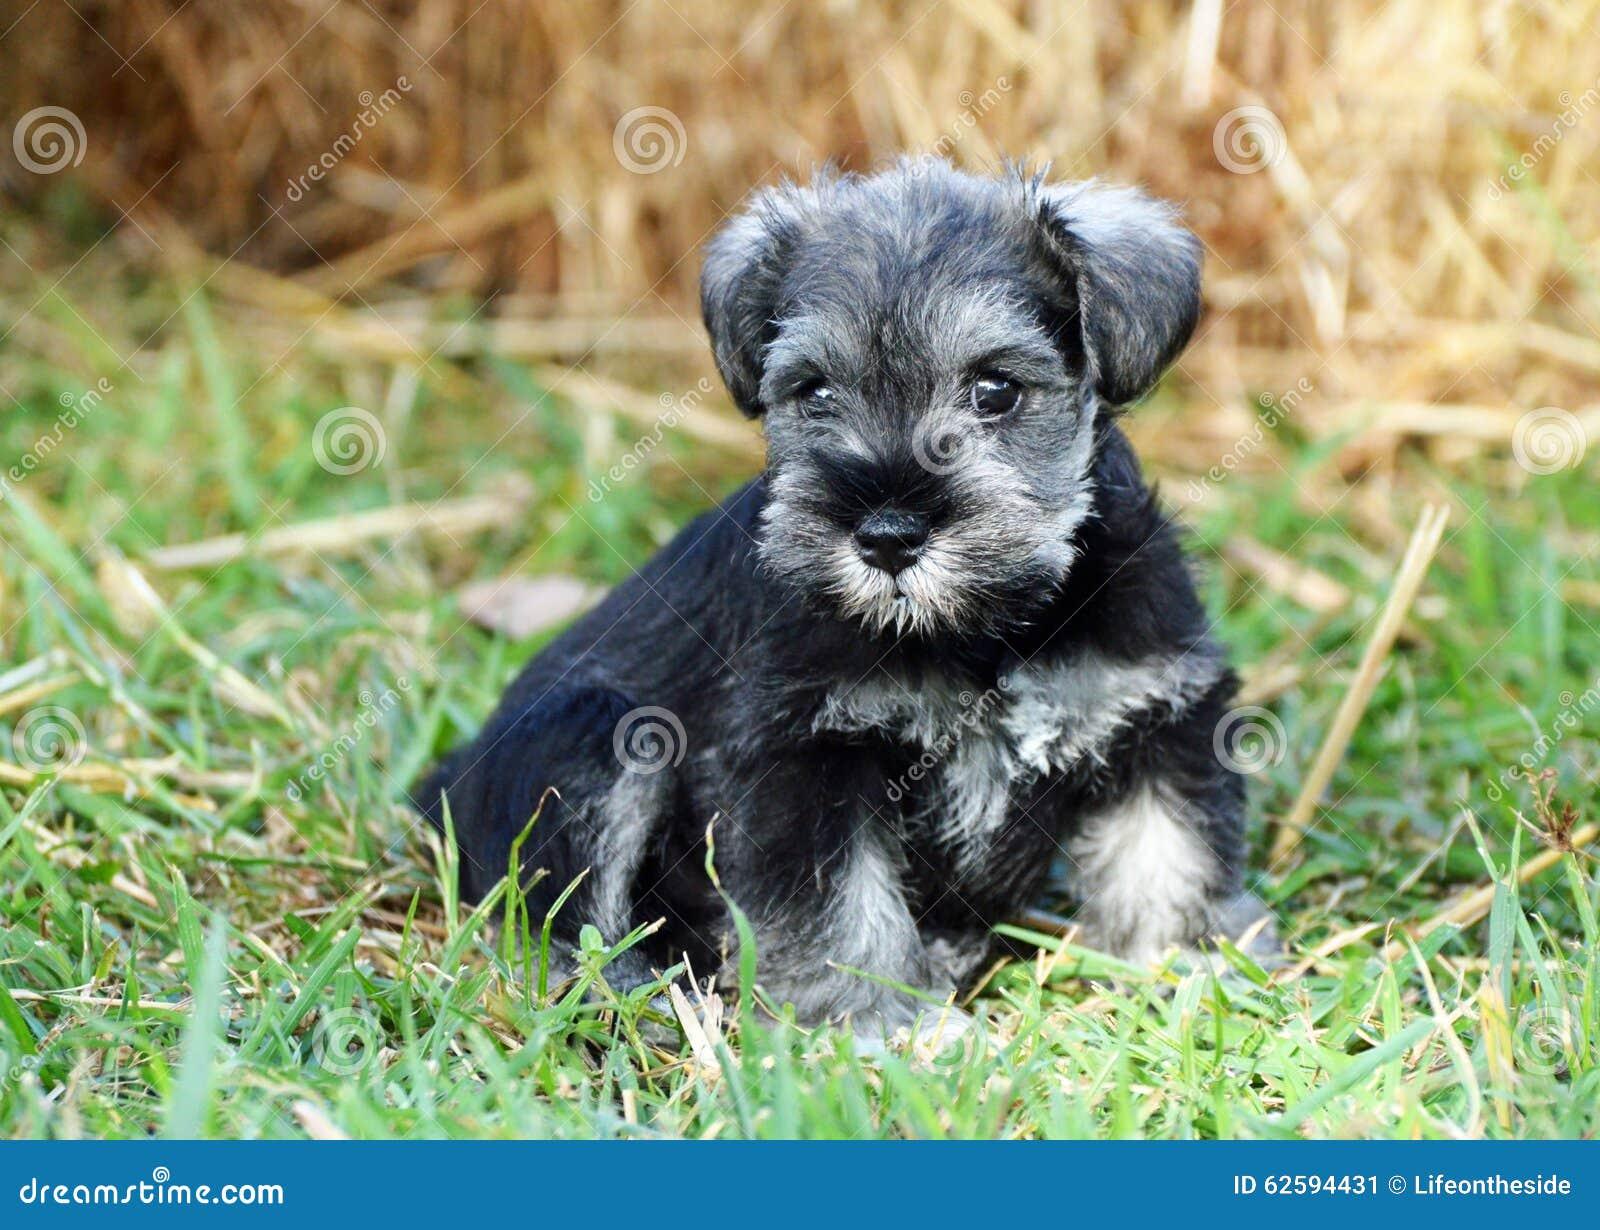 Miniature Schnauzer black and silver puppy dog outdoors portrait